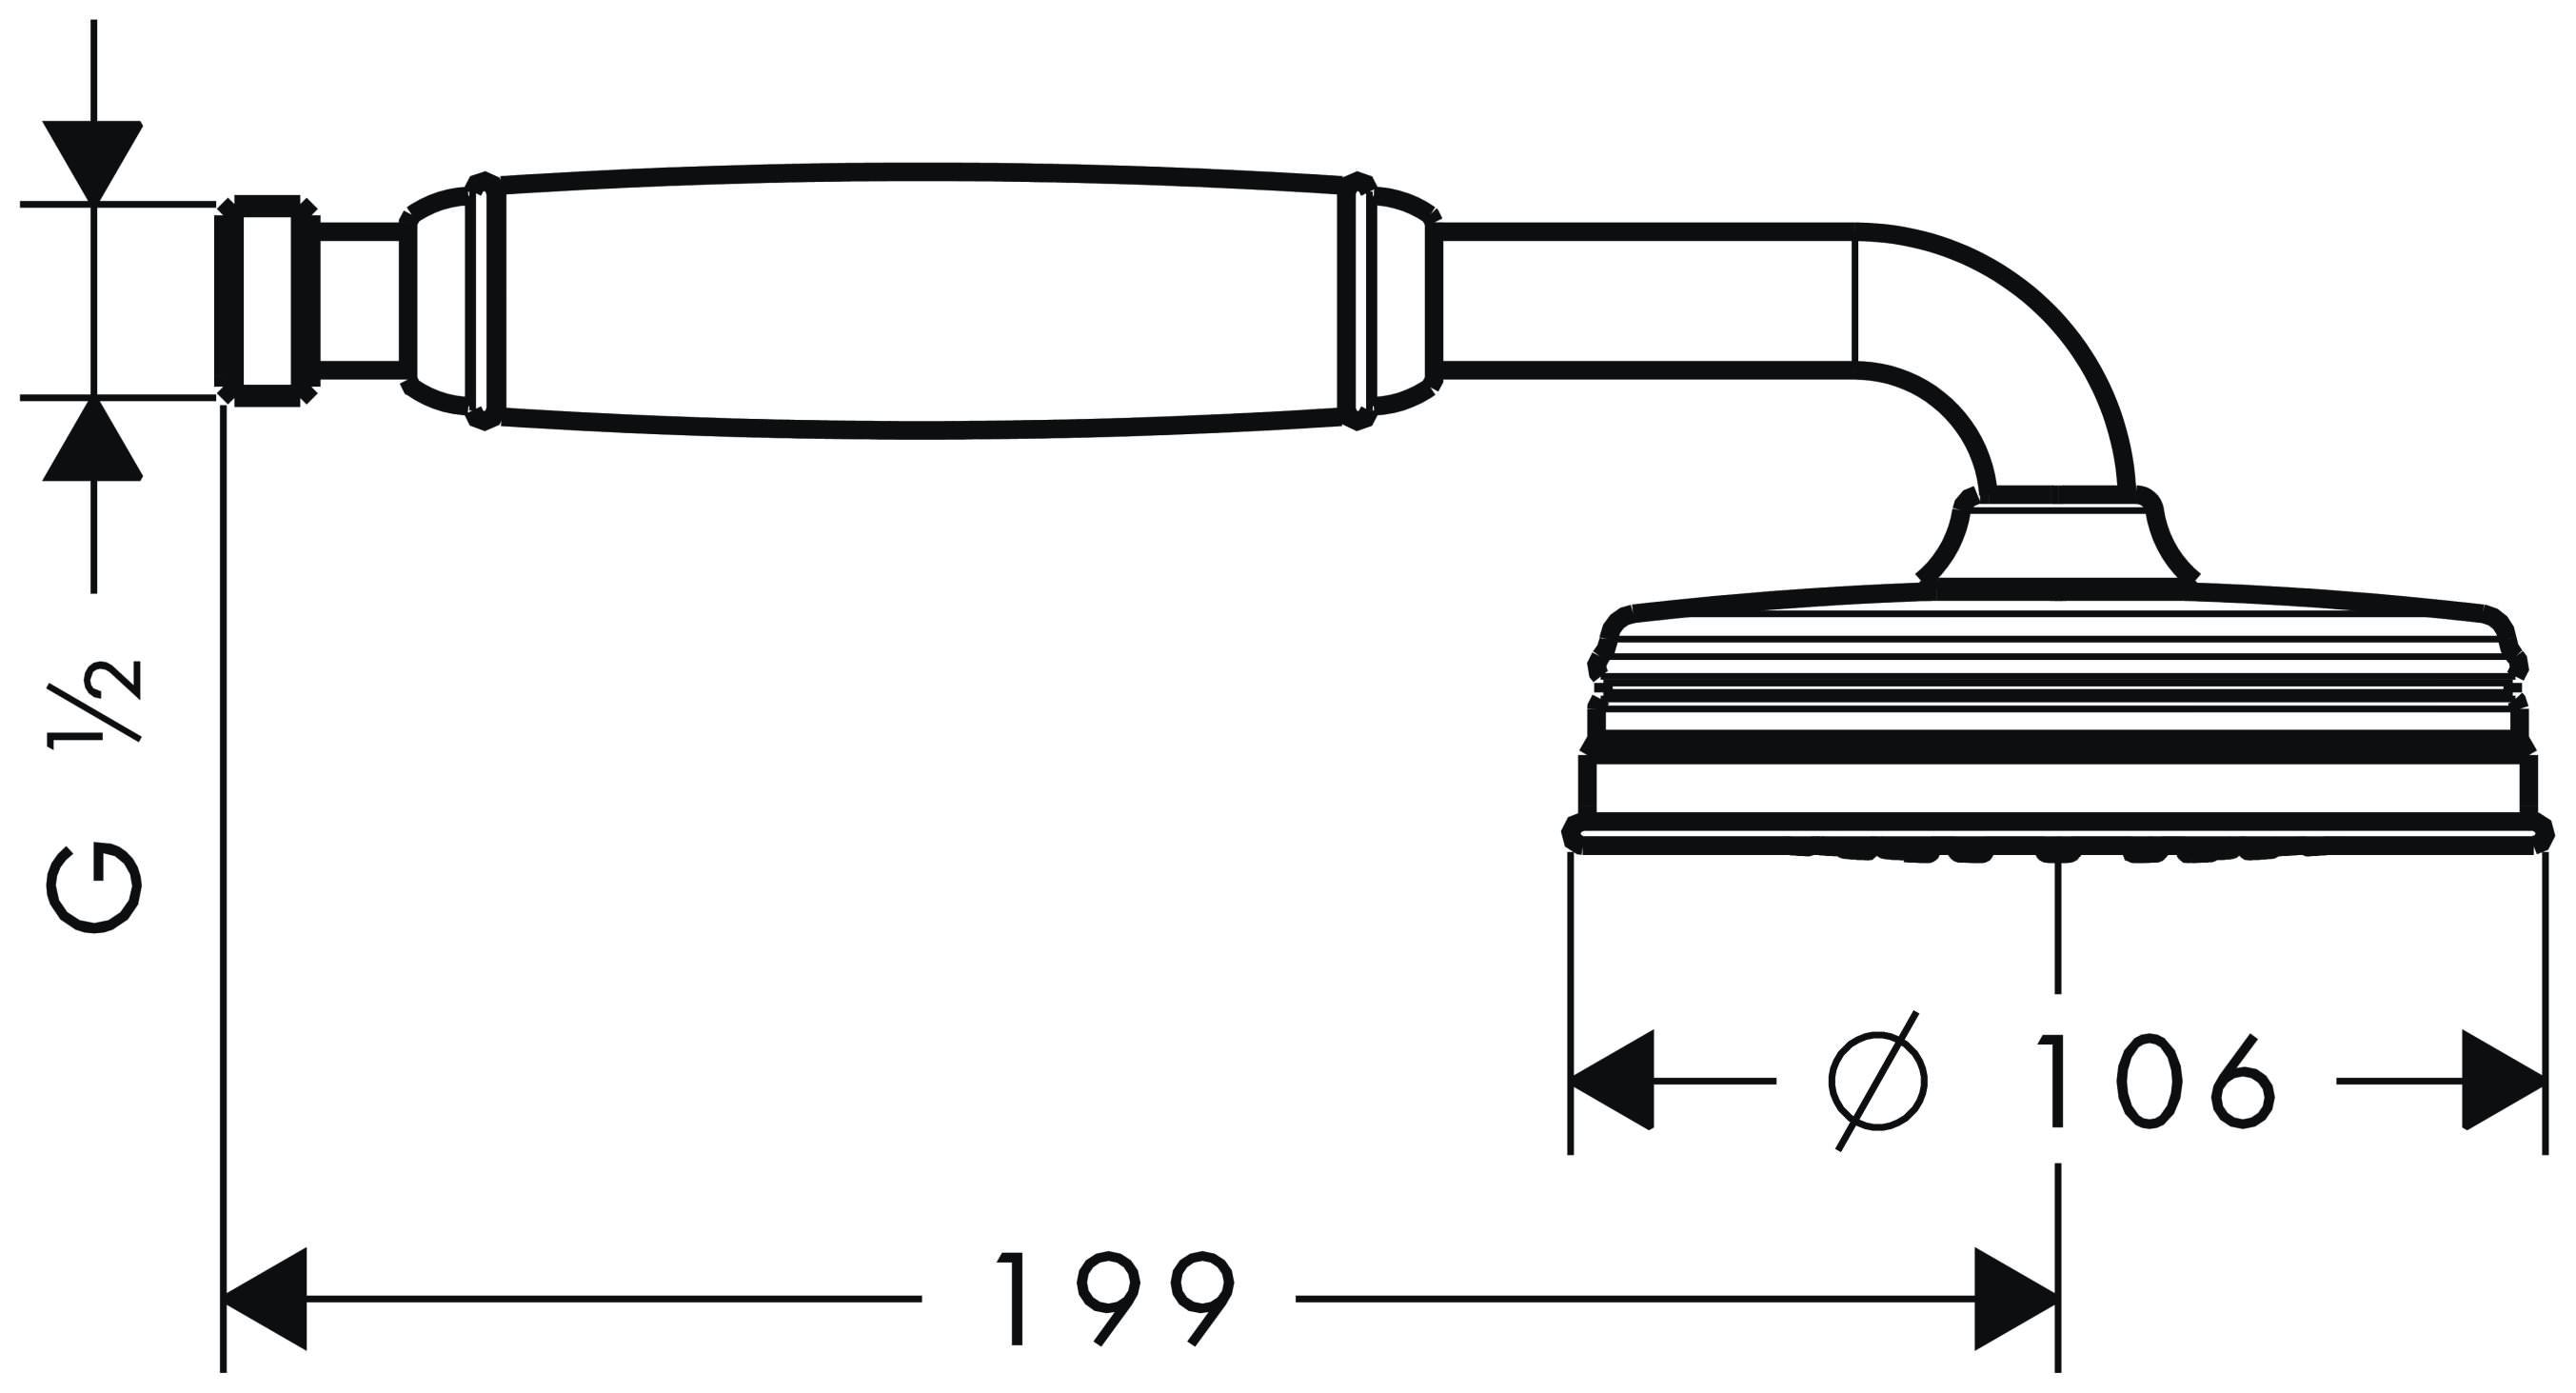 hansgrohe axor montreux handbrause brushed nickel 16320820. Black Bedroom Furniture Sets. Home Design Ideas